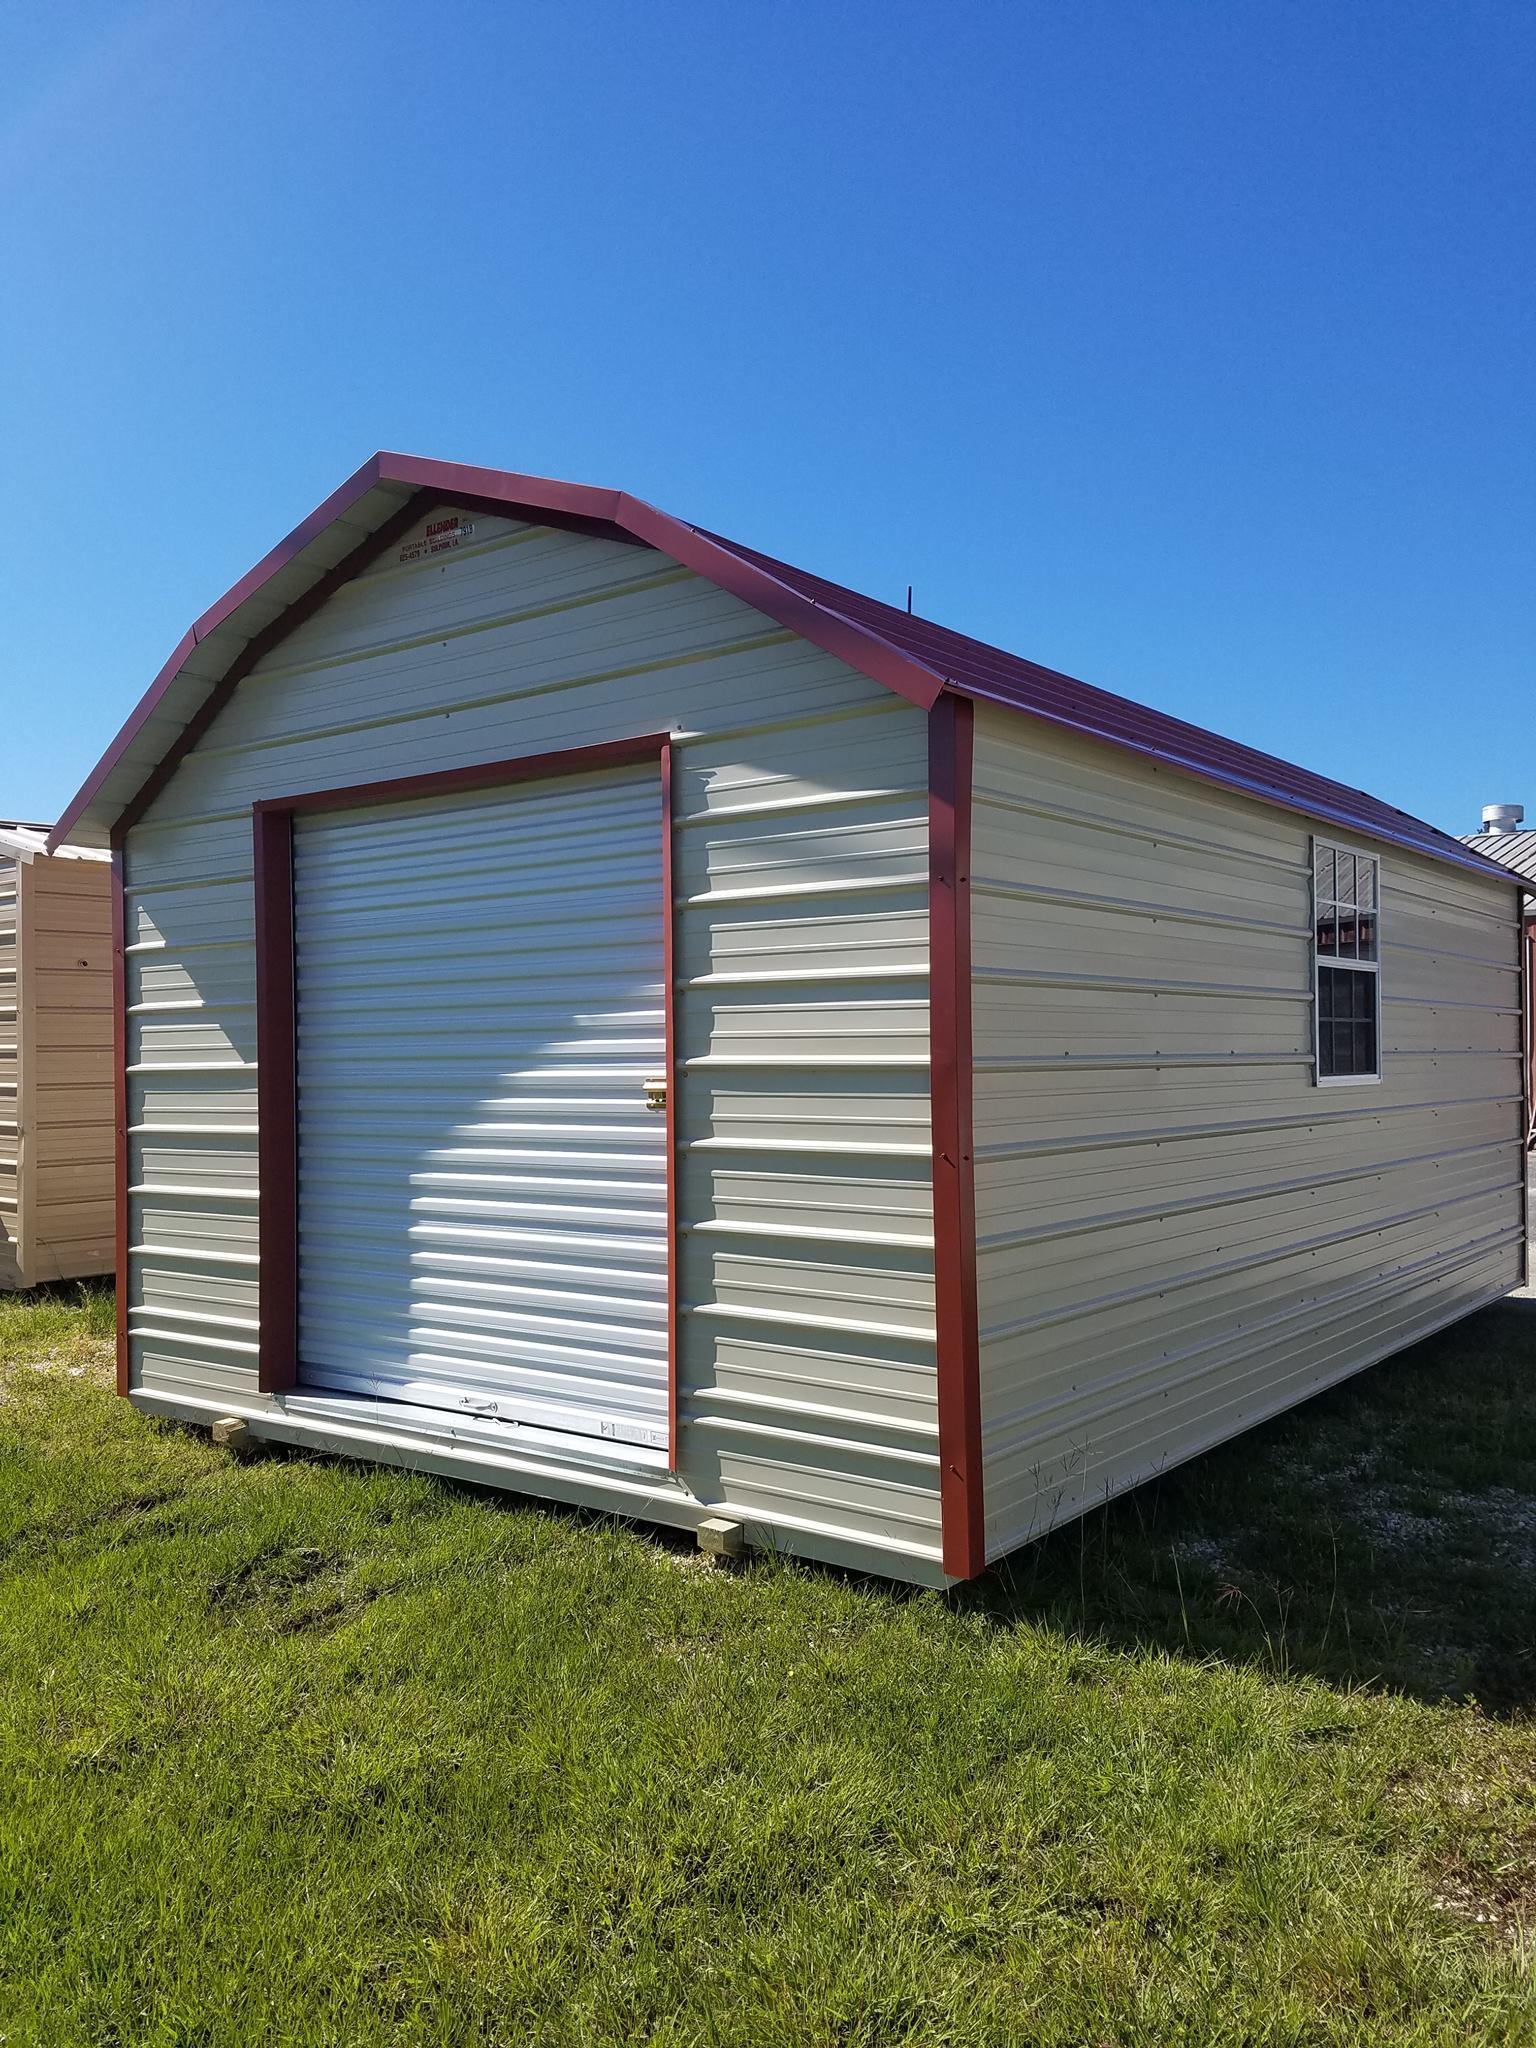 Ellender's Portable Buildings Coupons near me in Sulphur ...